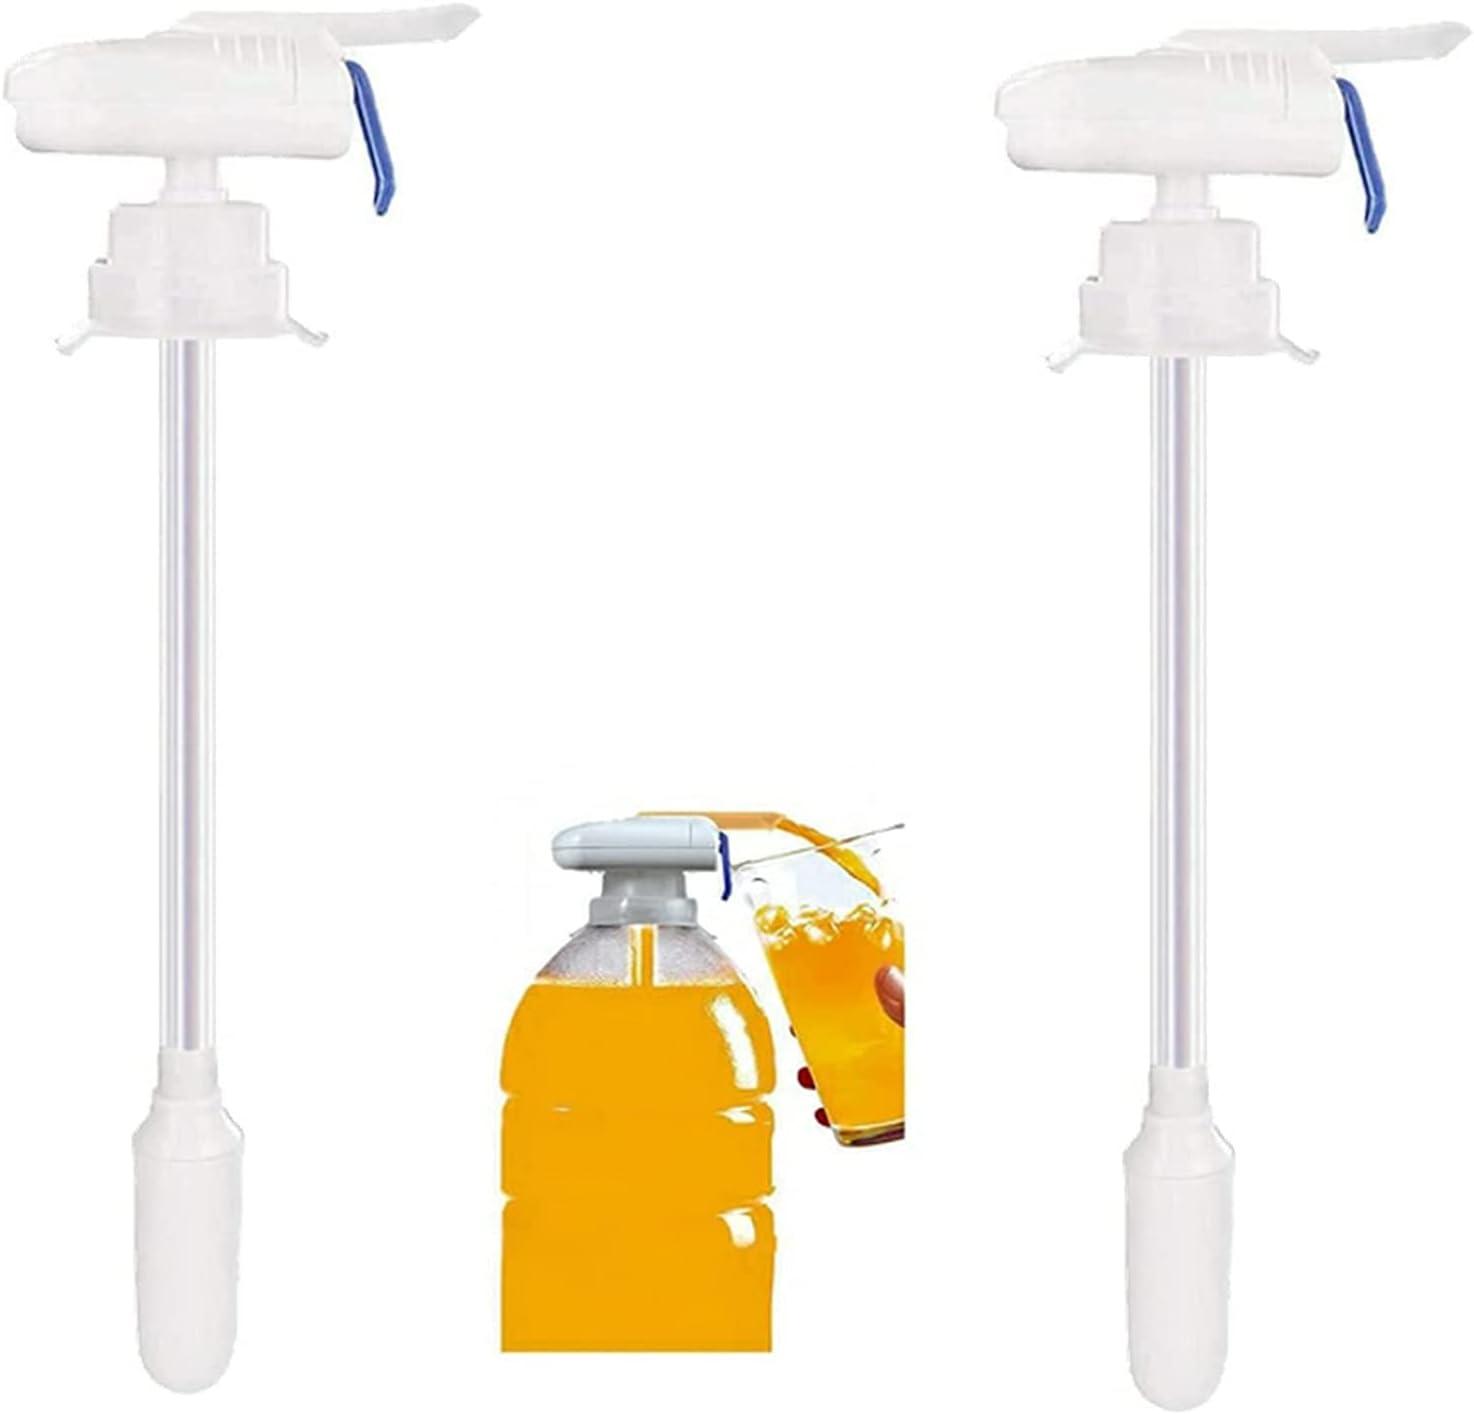 ZWIFEJIANQ Automatic Drink Dispenser, Electric Drink Dispenser Electric Tap, Creative Beverage Drink Dispenser Electric Automatic Drinking Straw for Juice Milk Spill-proof Drinks Suck Tools (2Pcs)